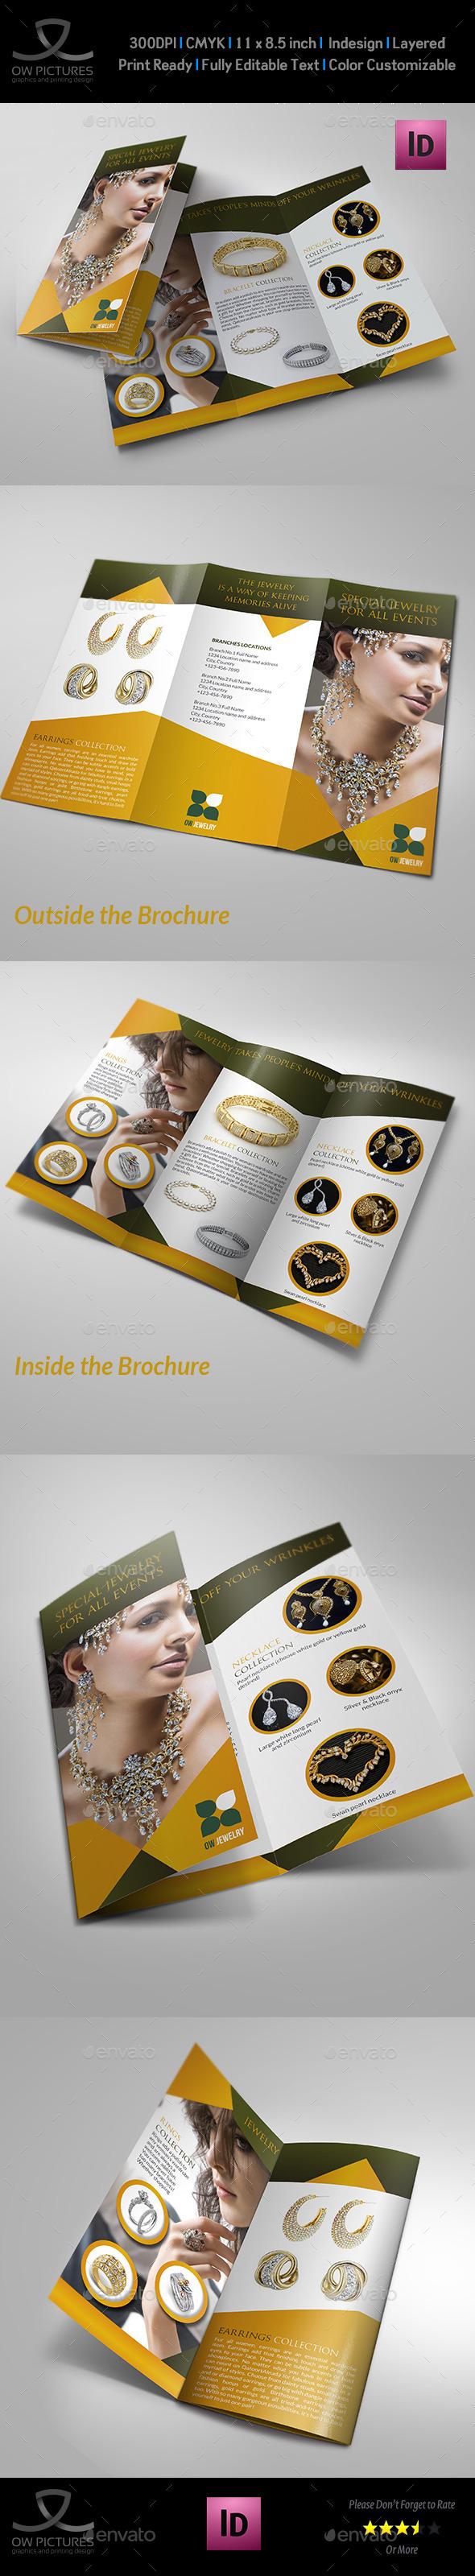 GraphicRiver Jewelry and Accessories Tri Fold Catalog Brochure 11416745